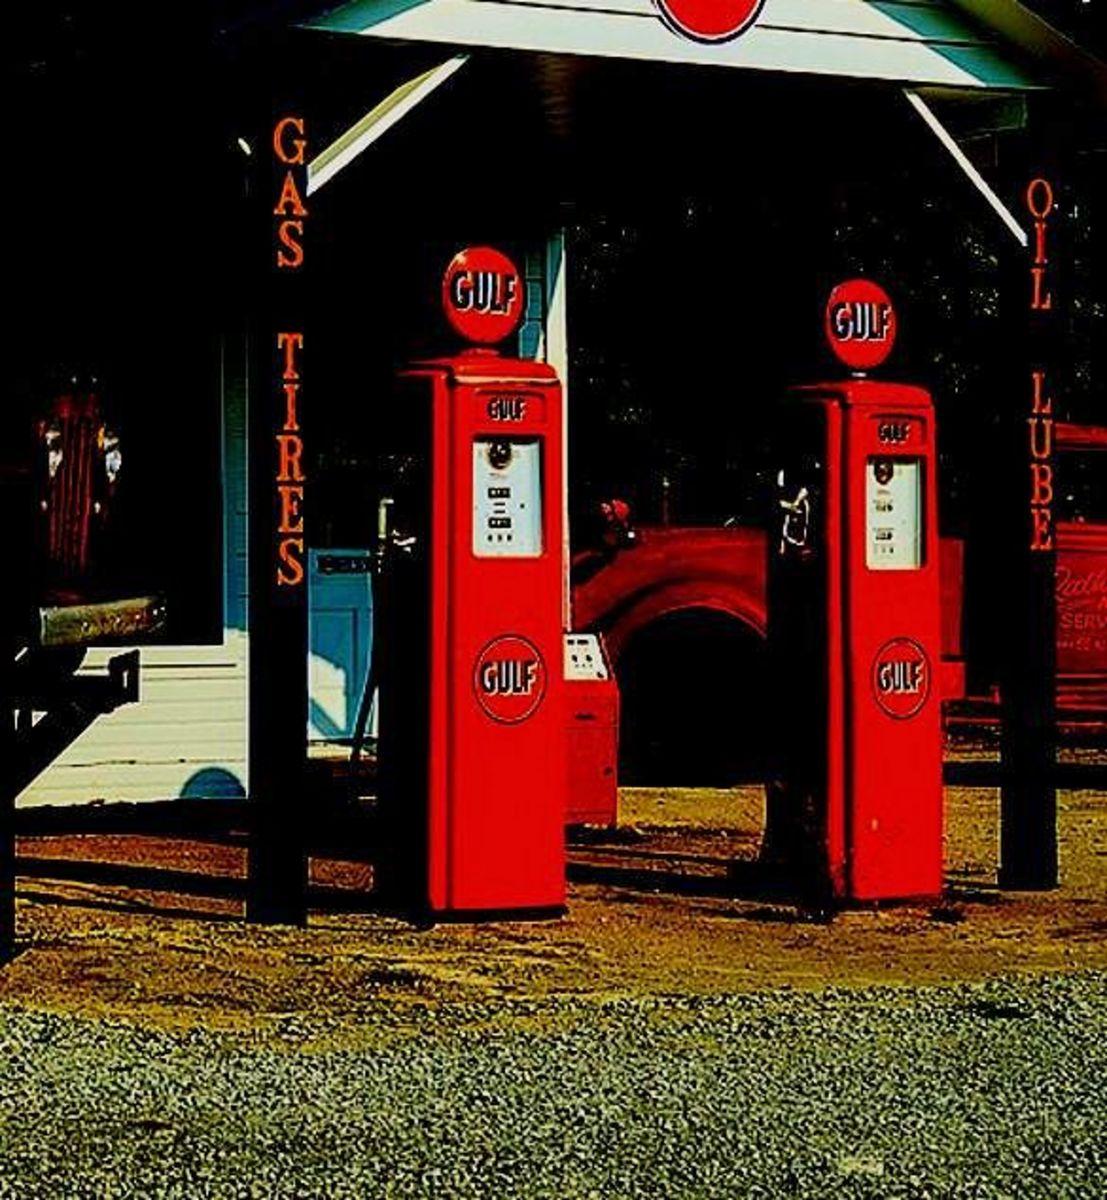 Gas Station in Summersend